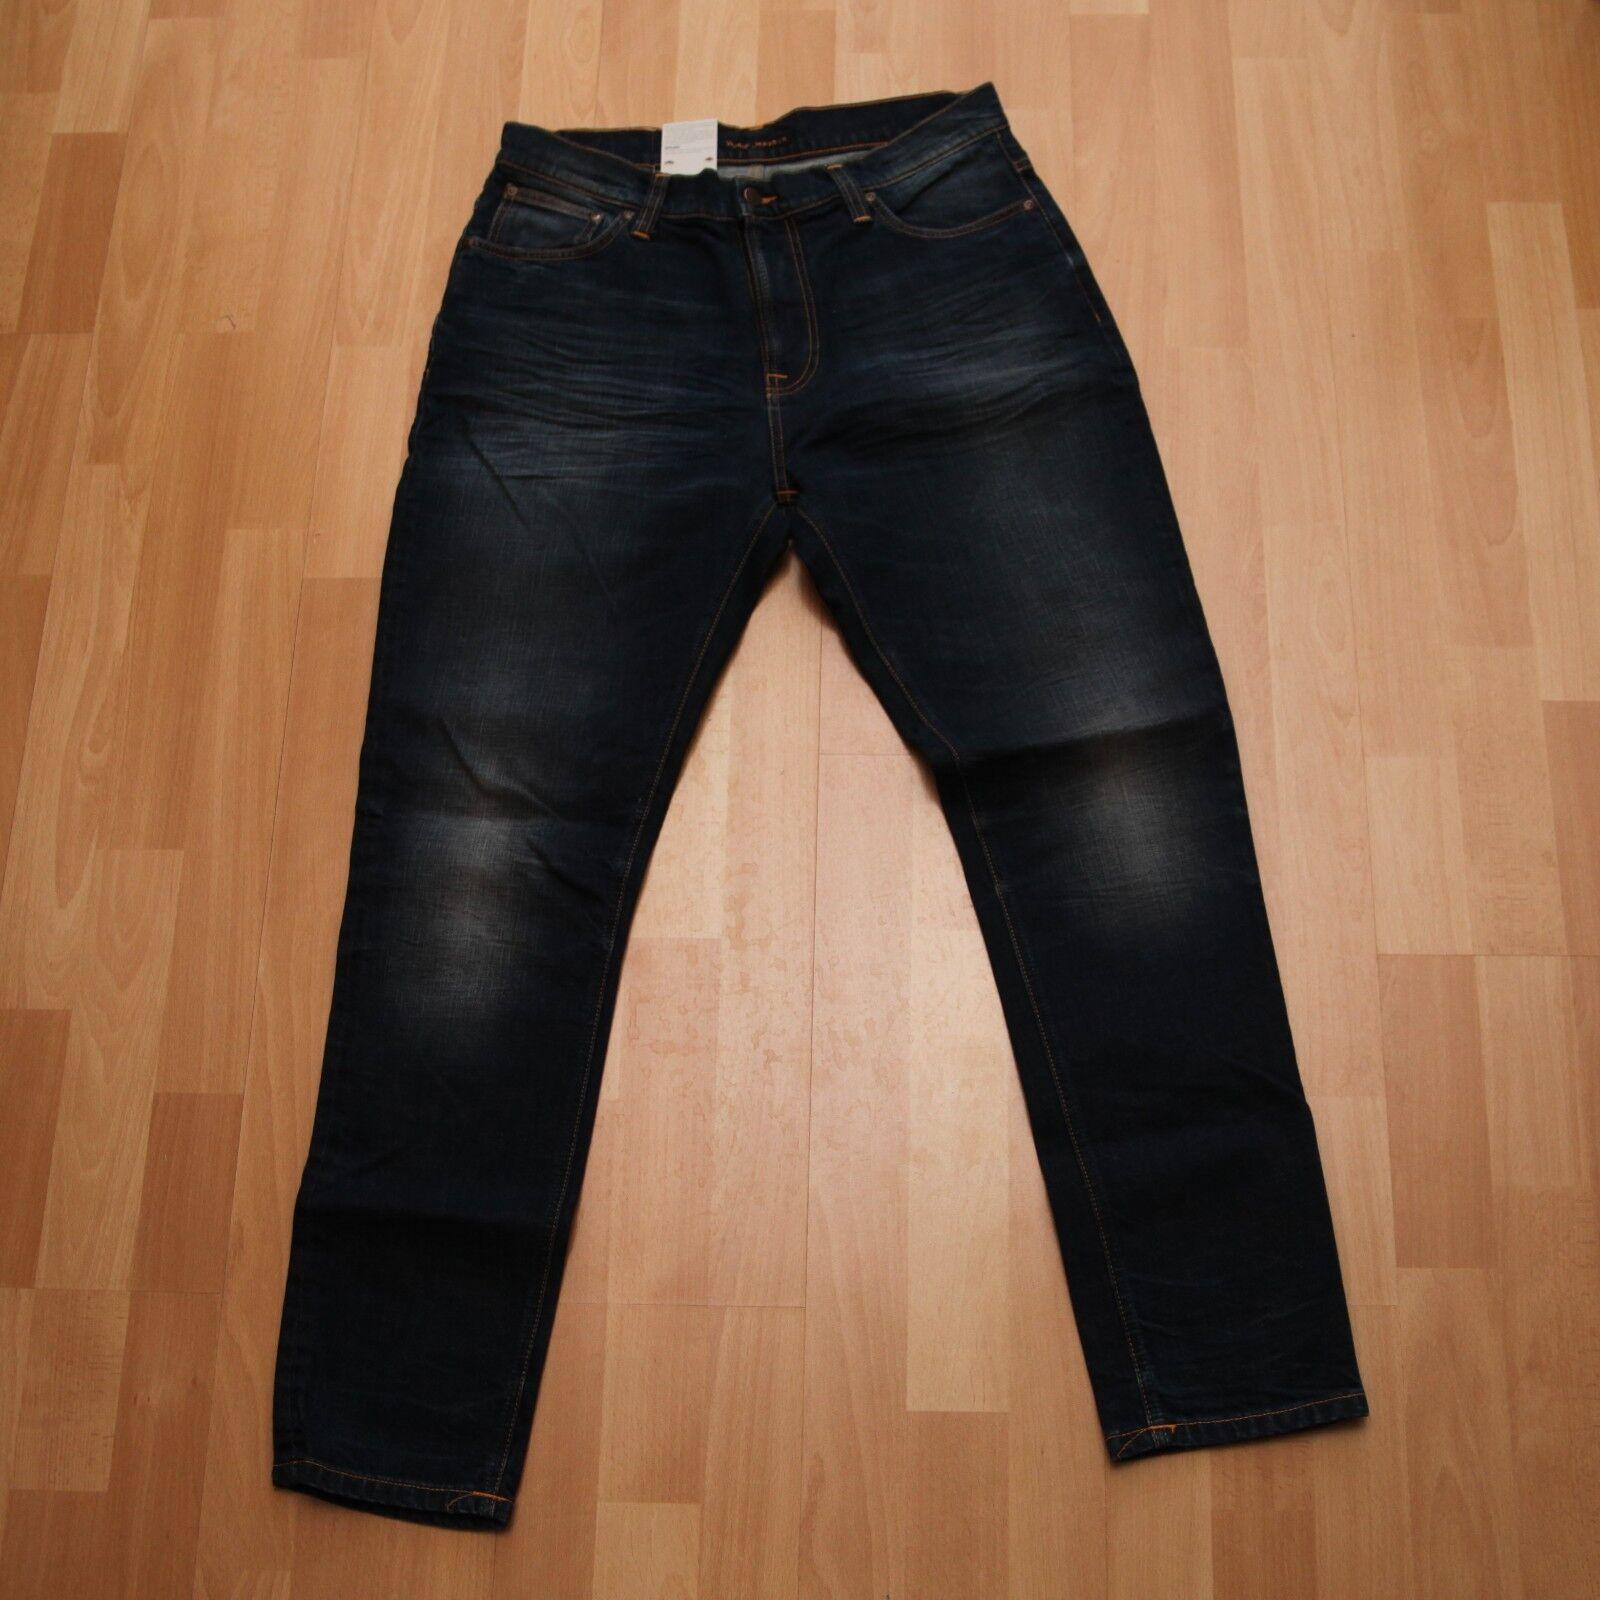 NEU Nudie Jeans  Brute Knut (Anti Fit taperot leg) Dark Dusk 32 30